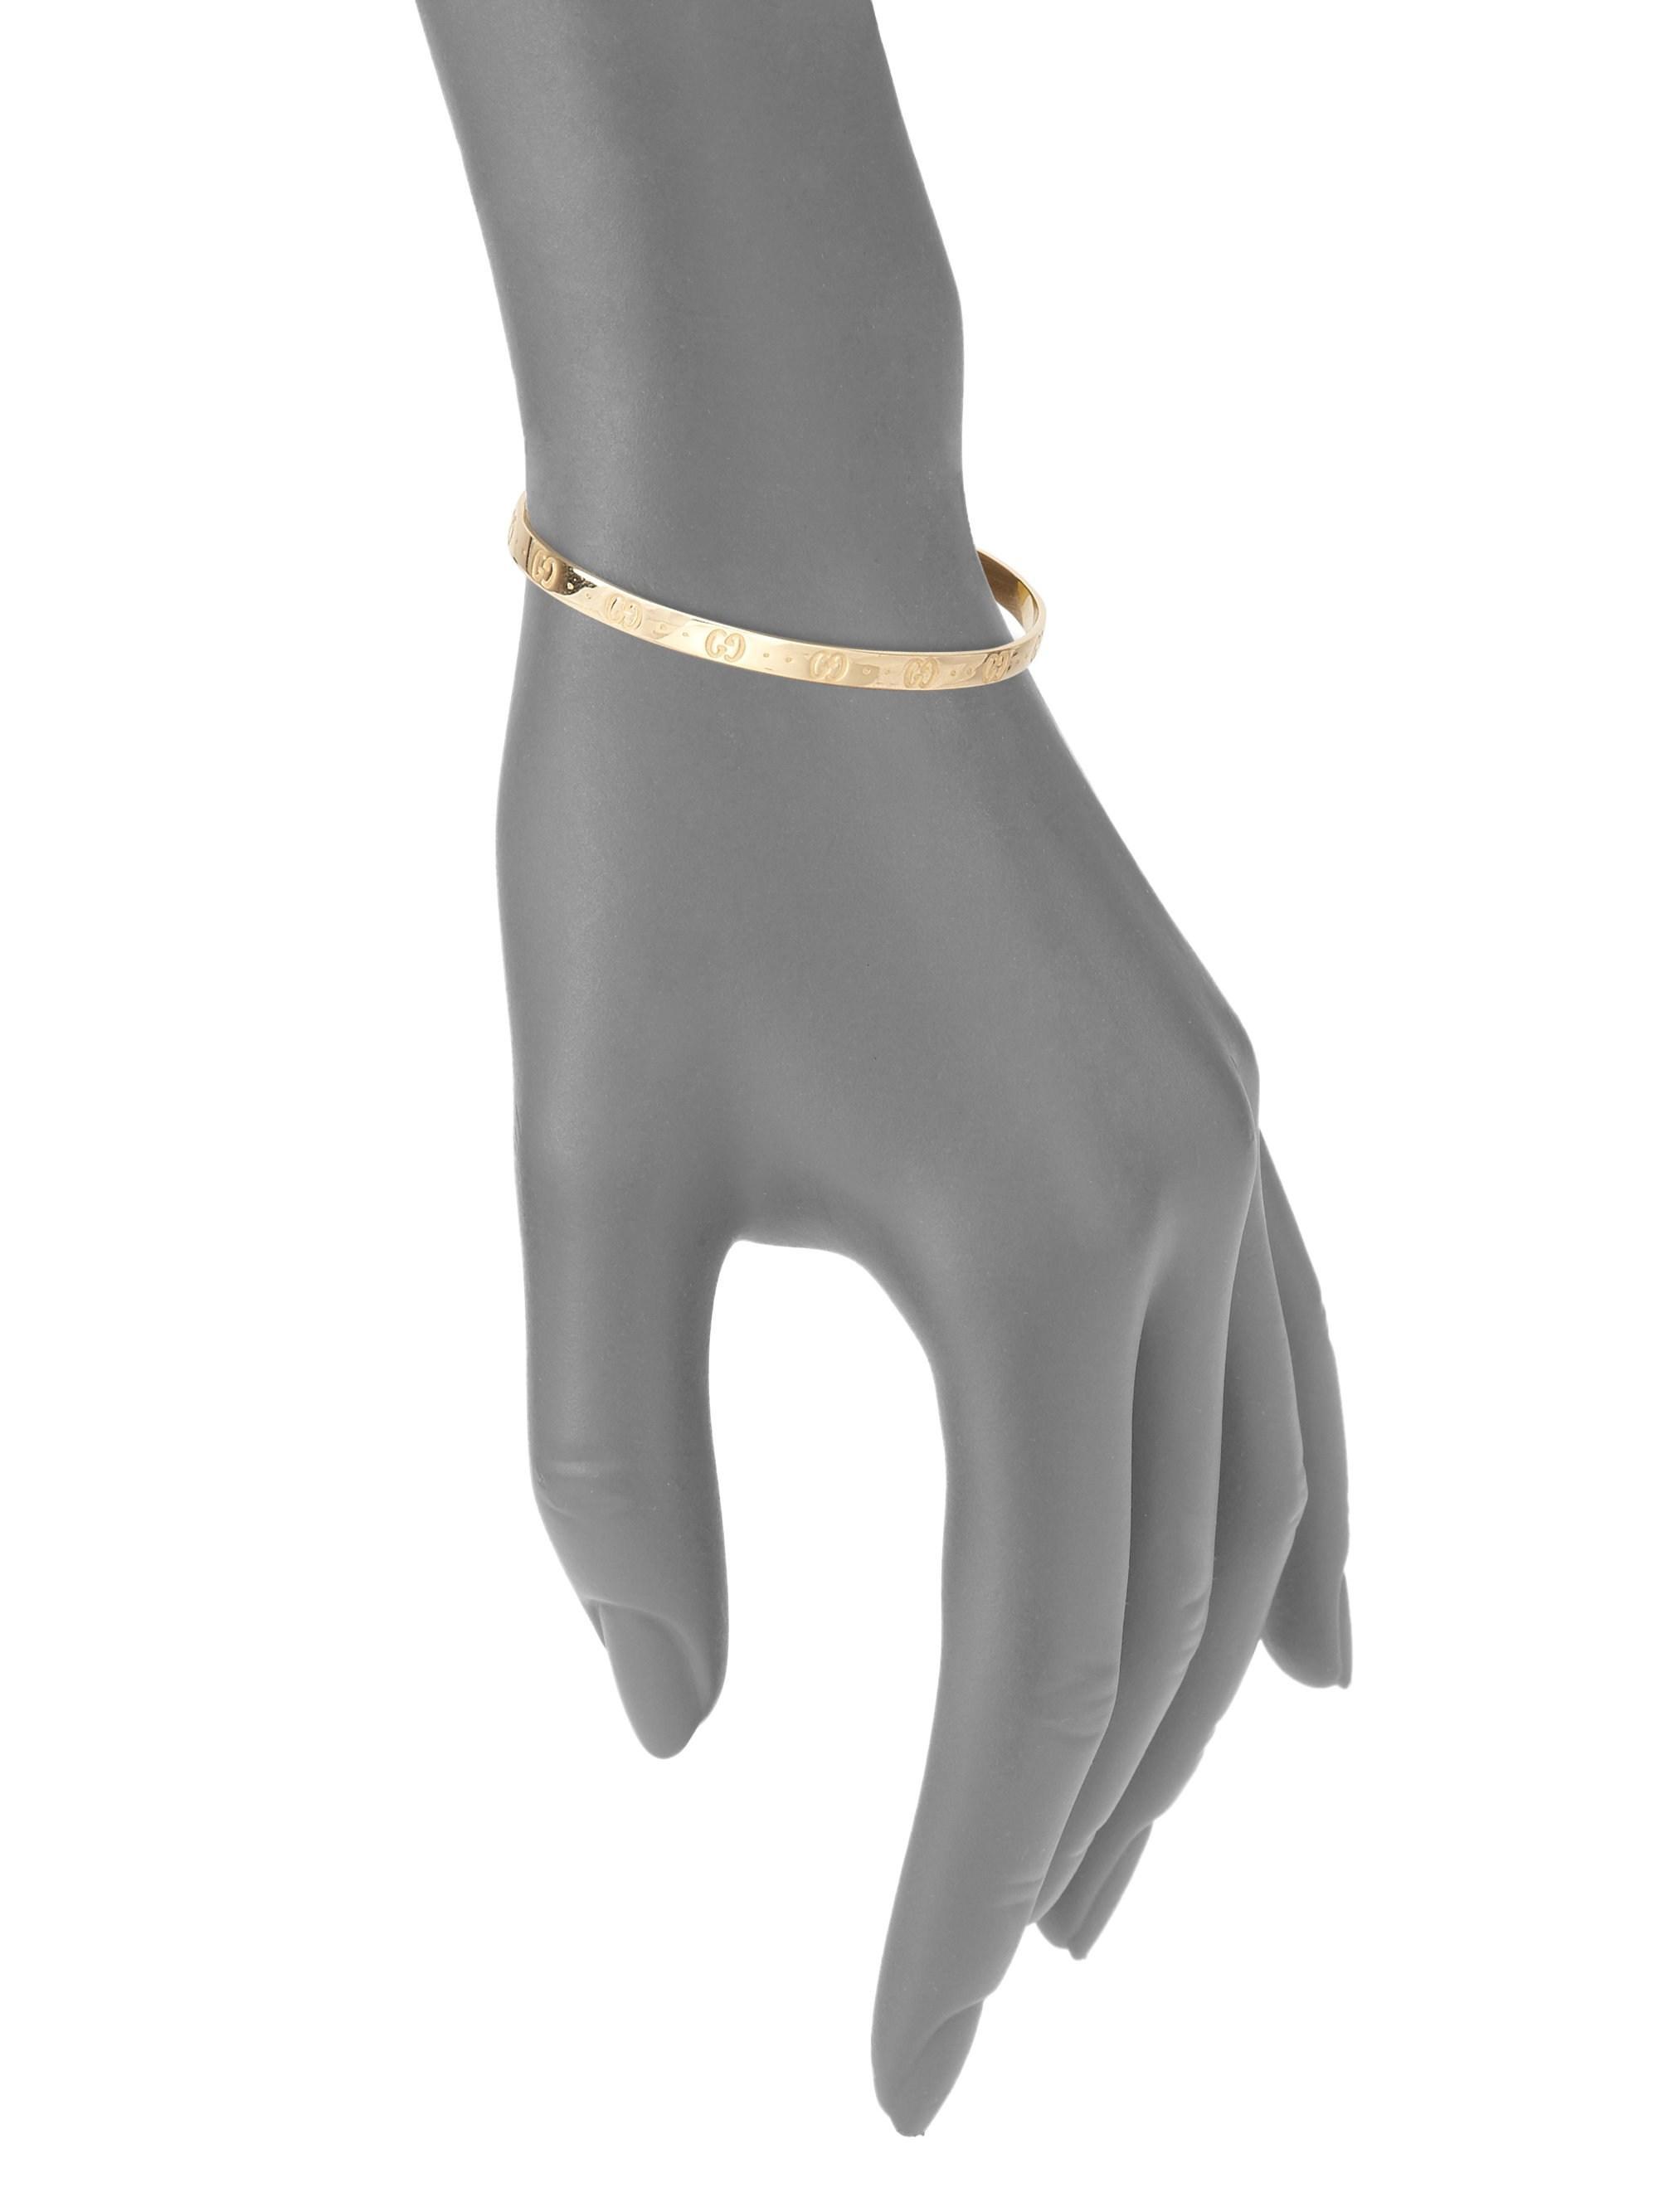 e936fa41856 Gucci - Metallic Women s Icon 18k Yellow Gold Bangle Bracelet - Gold -  Lyst. View fullscreen